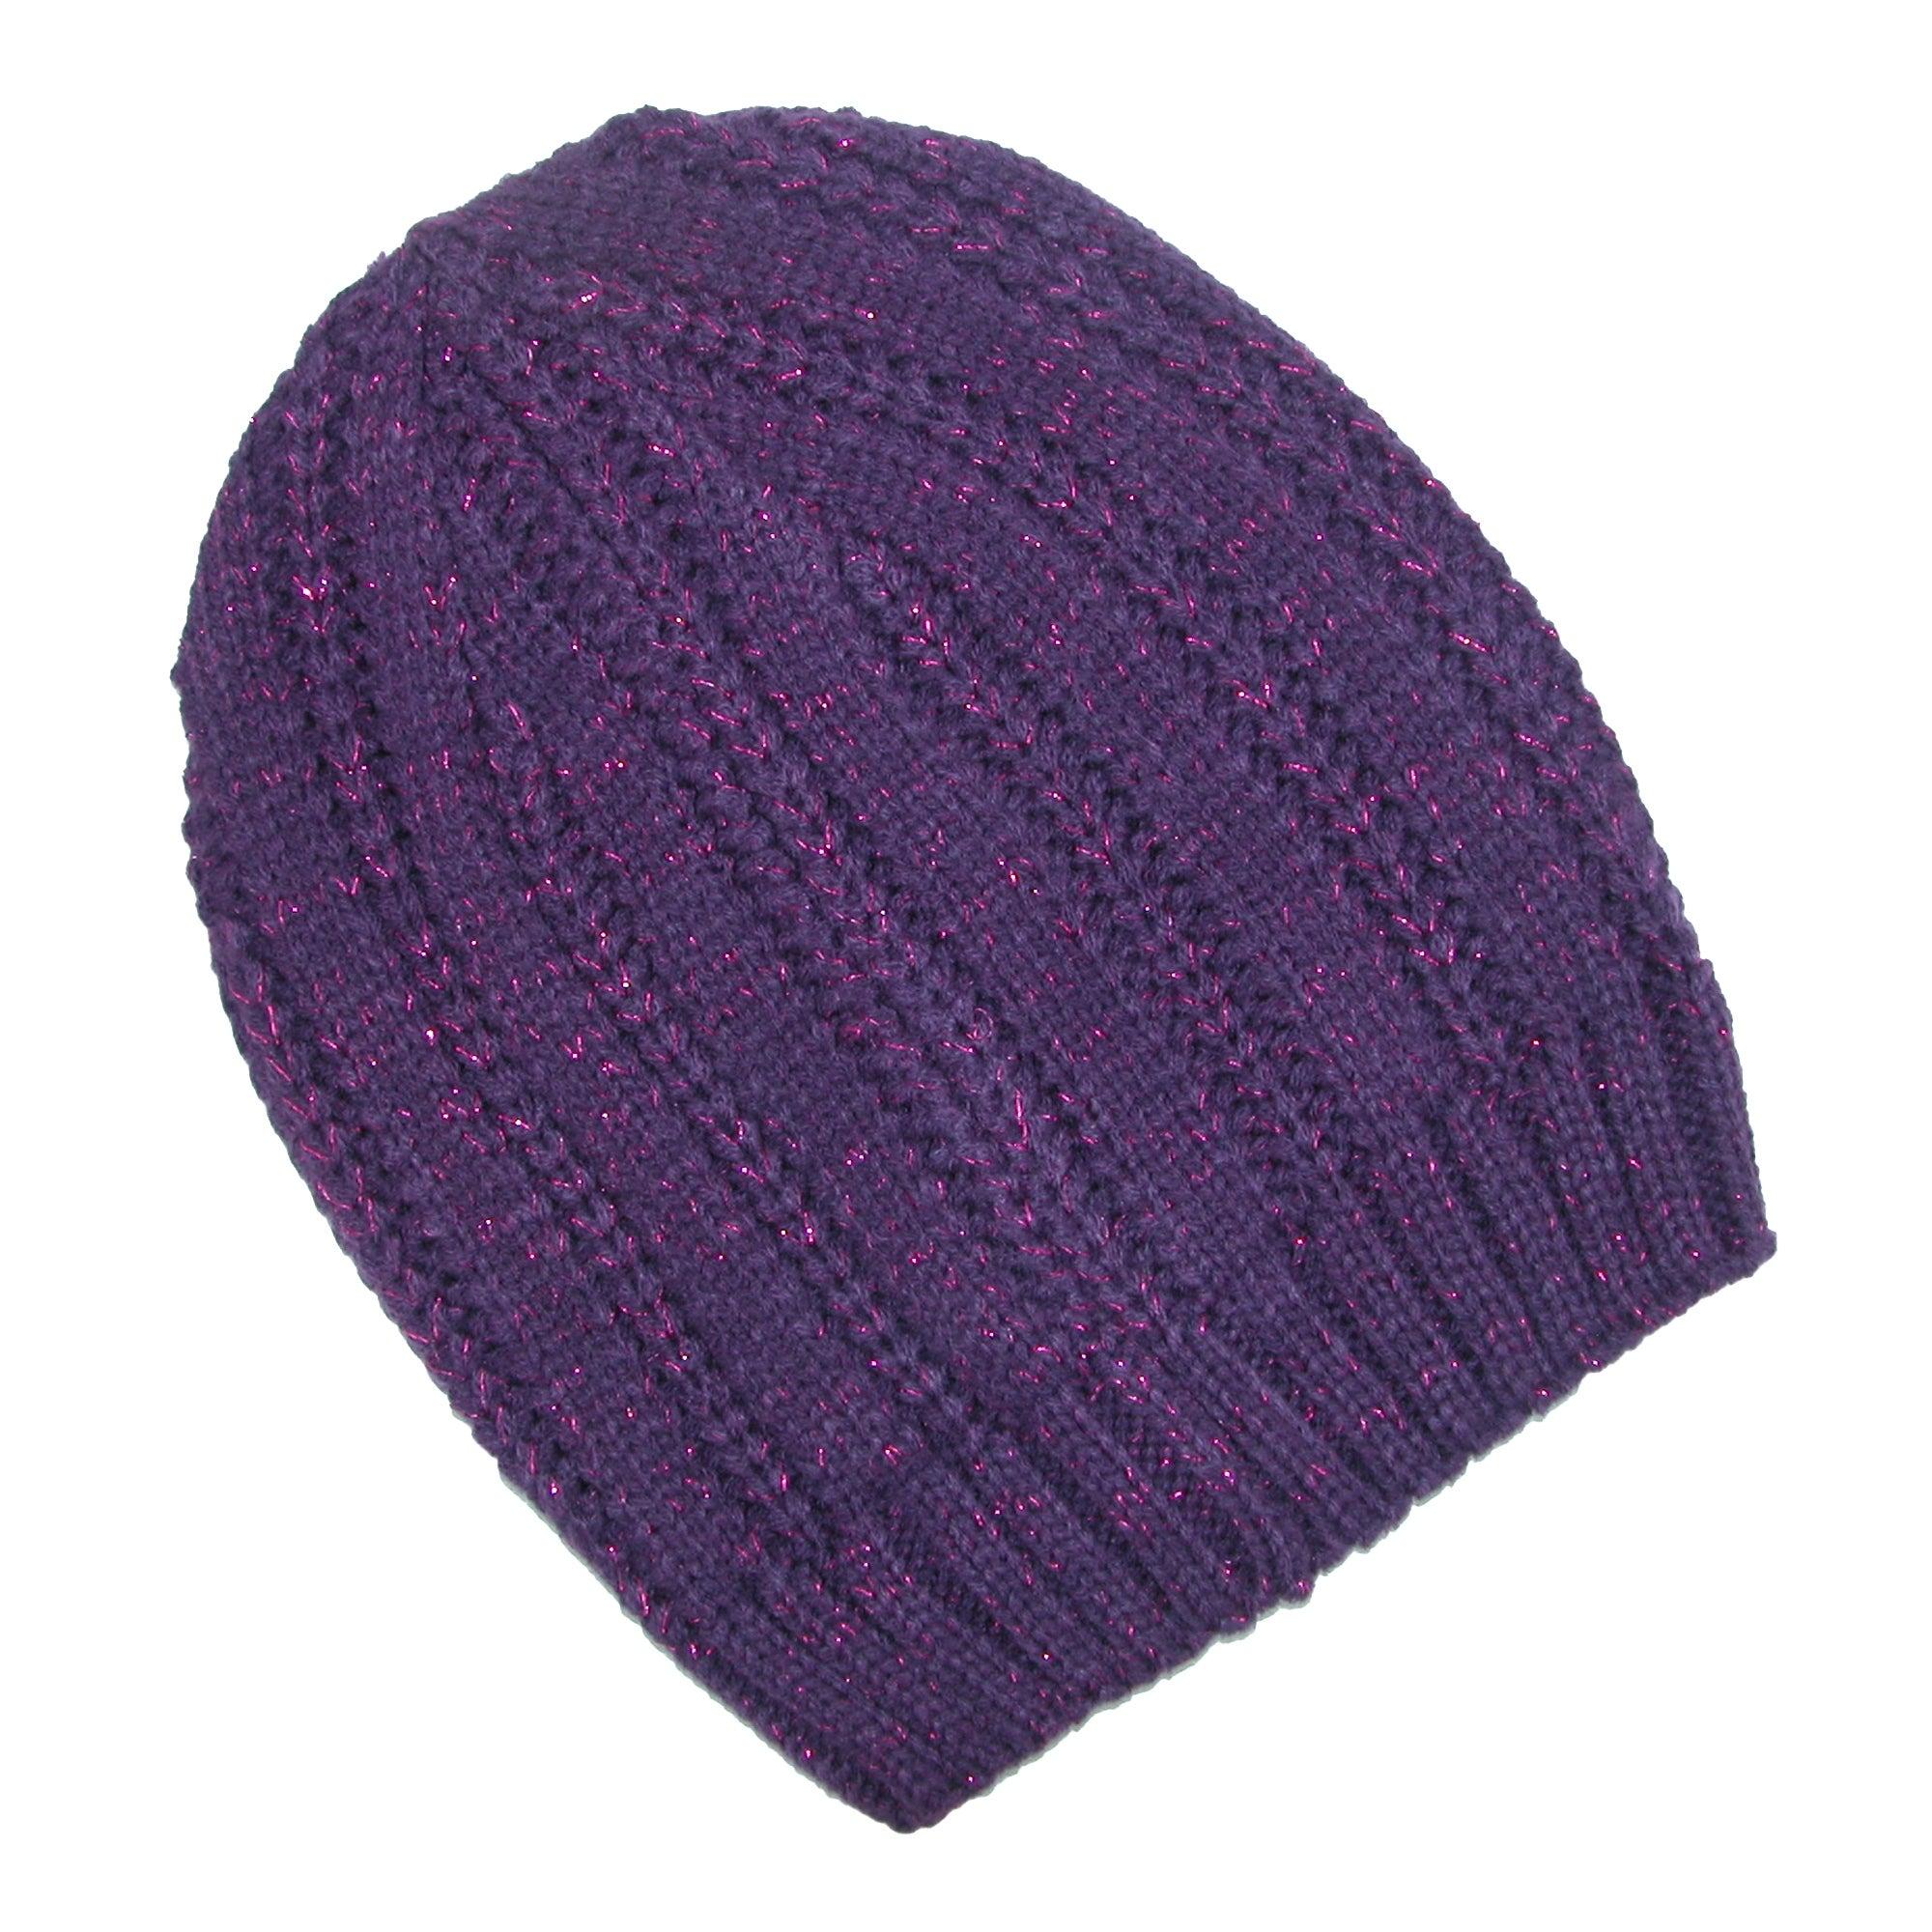 Shop DPC Outdoor Design Girls  Insulated Slouchy Beanie Hat - Free ... f66b7cfbf17